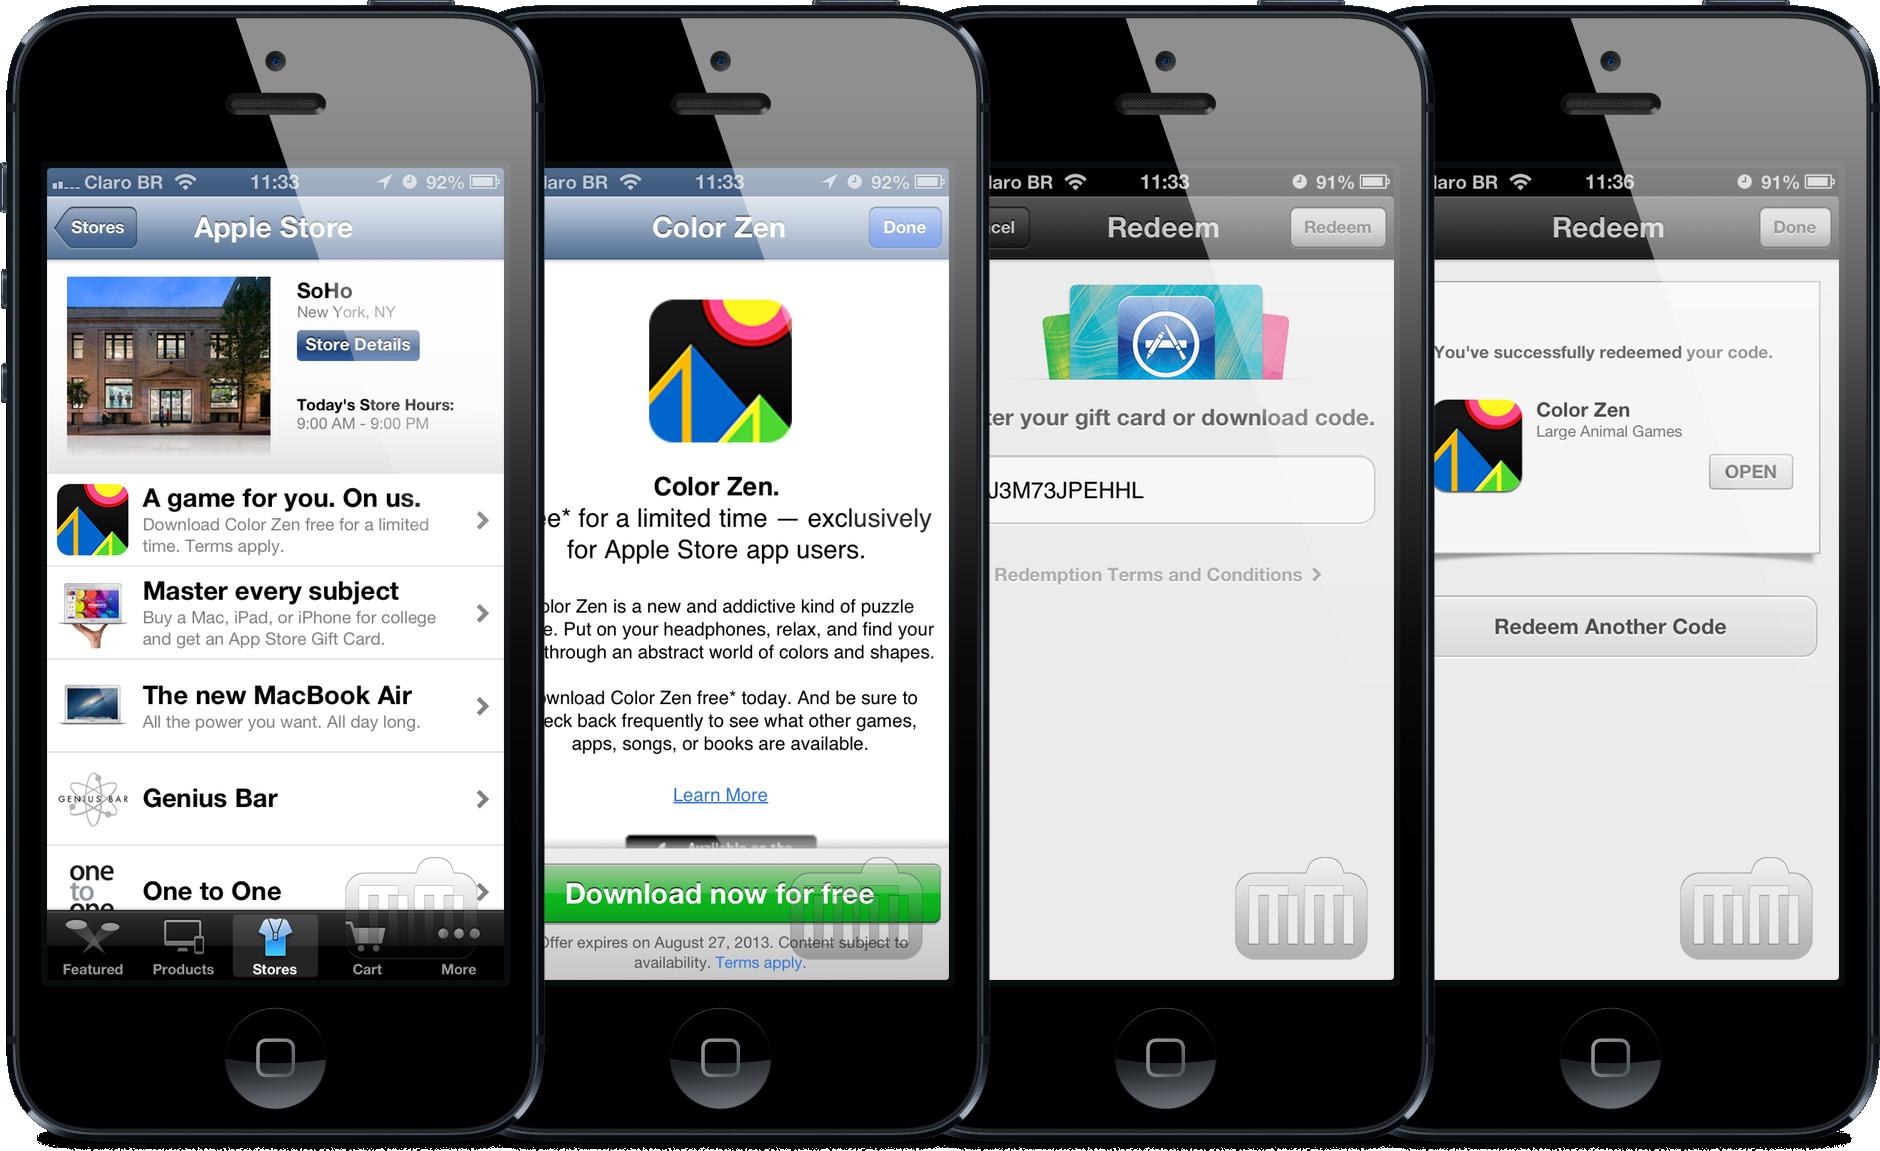 Oferta no app Apple Store